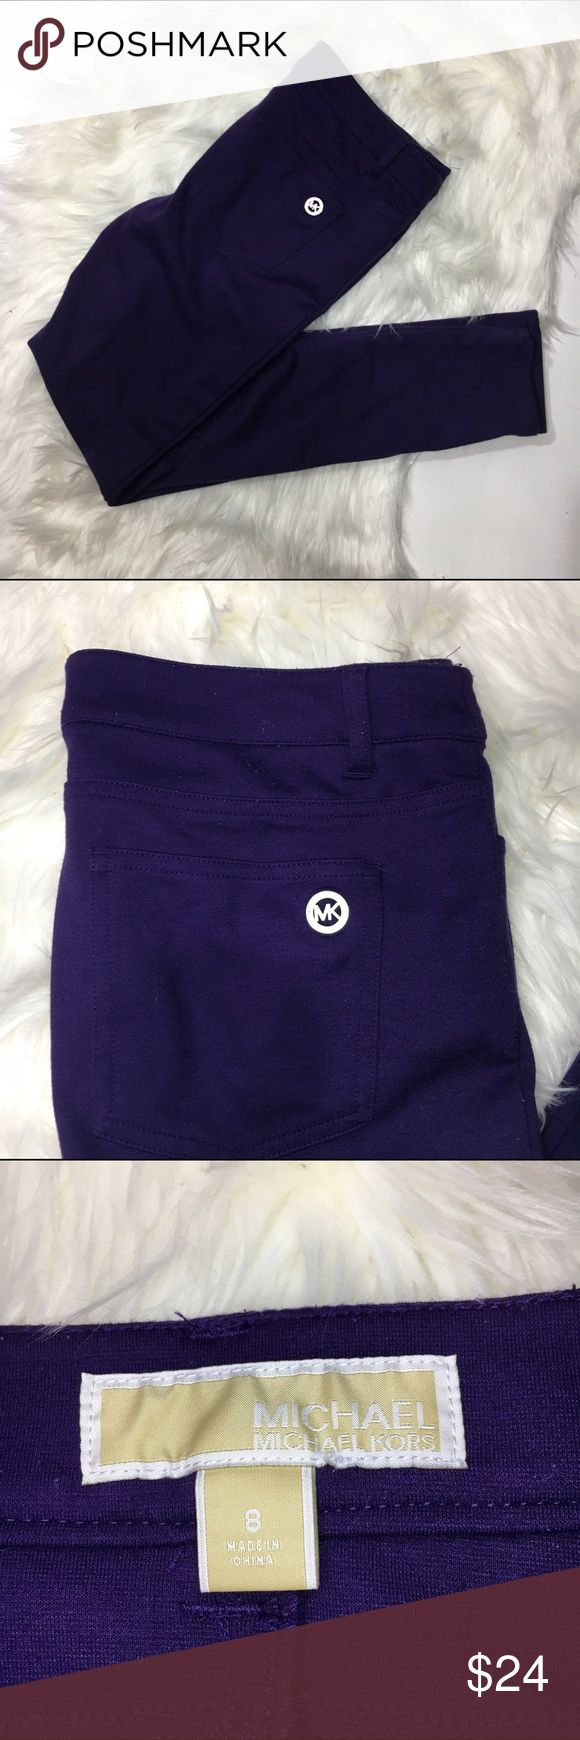 "Michael Kors Stretch purple jegging Women's Michael kors stretch purple skinny jegging. some pilling to fabric. size 8  waist laying flat-17"" inseam-29"" MICHAEL Michael Kors Pants Leggings"